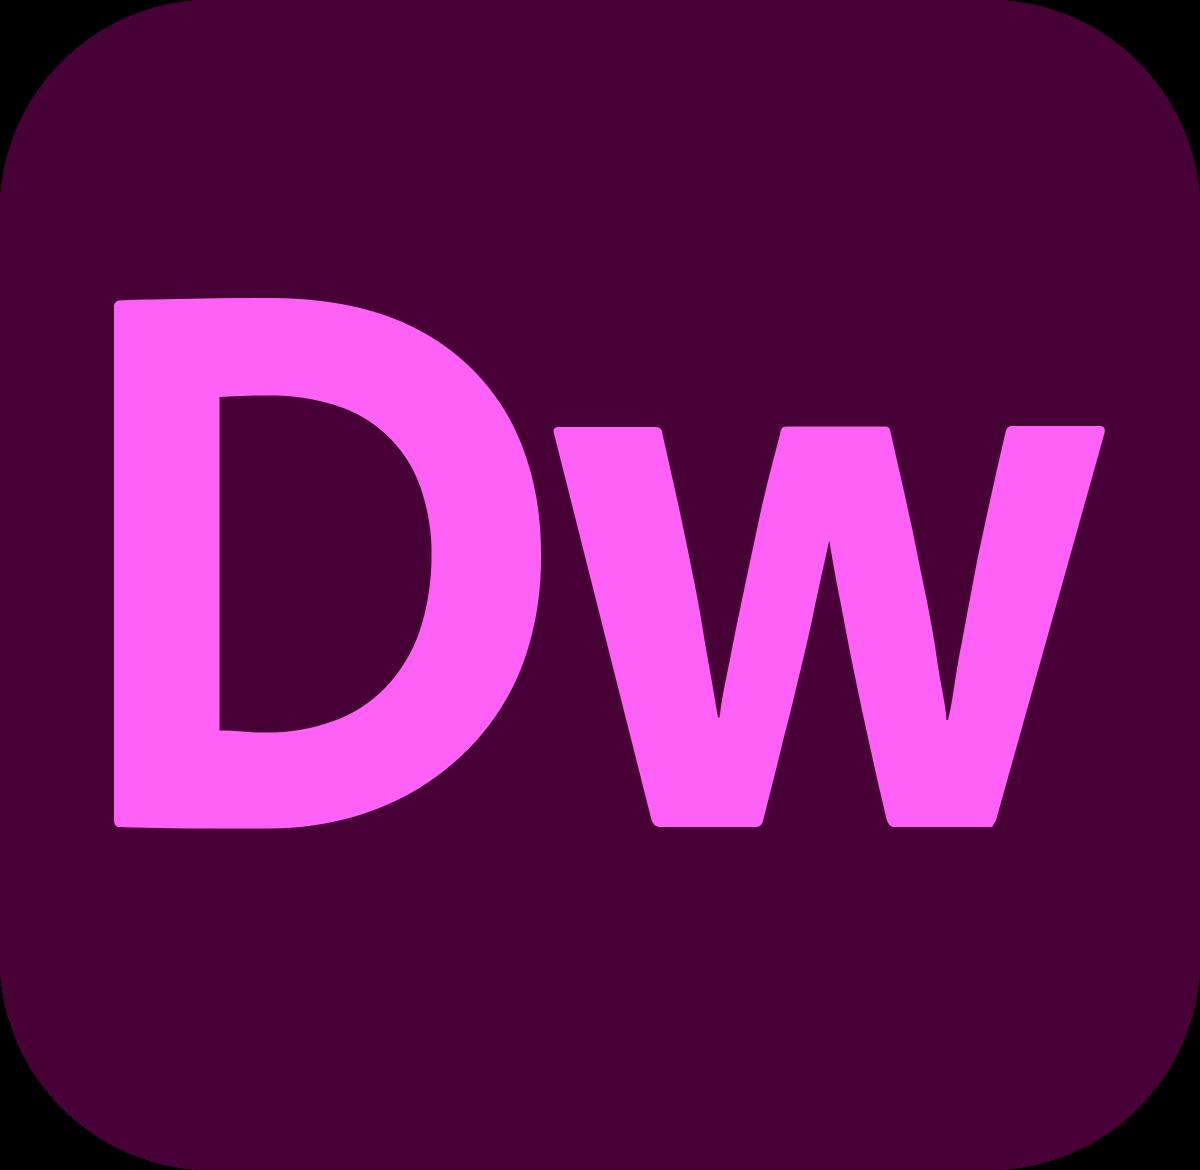 Adobe Dreamweaver Single App